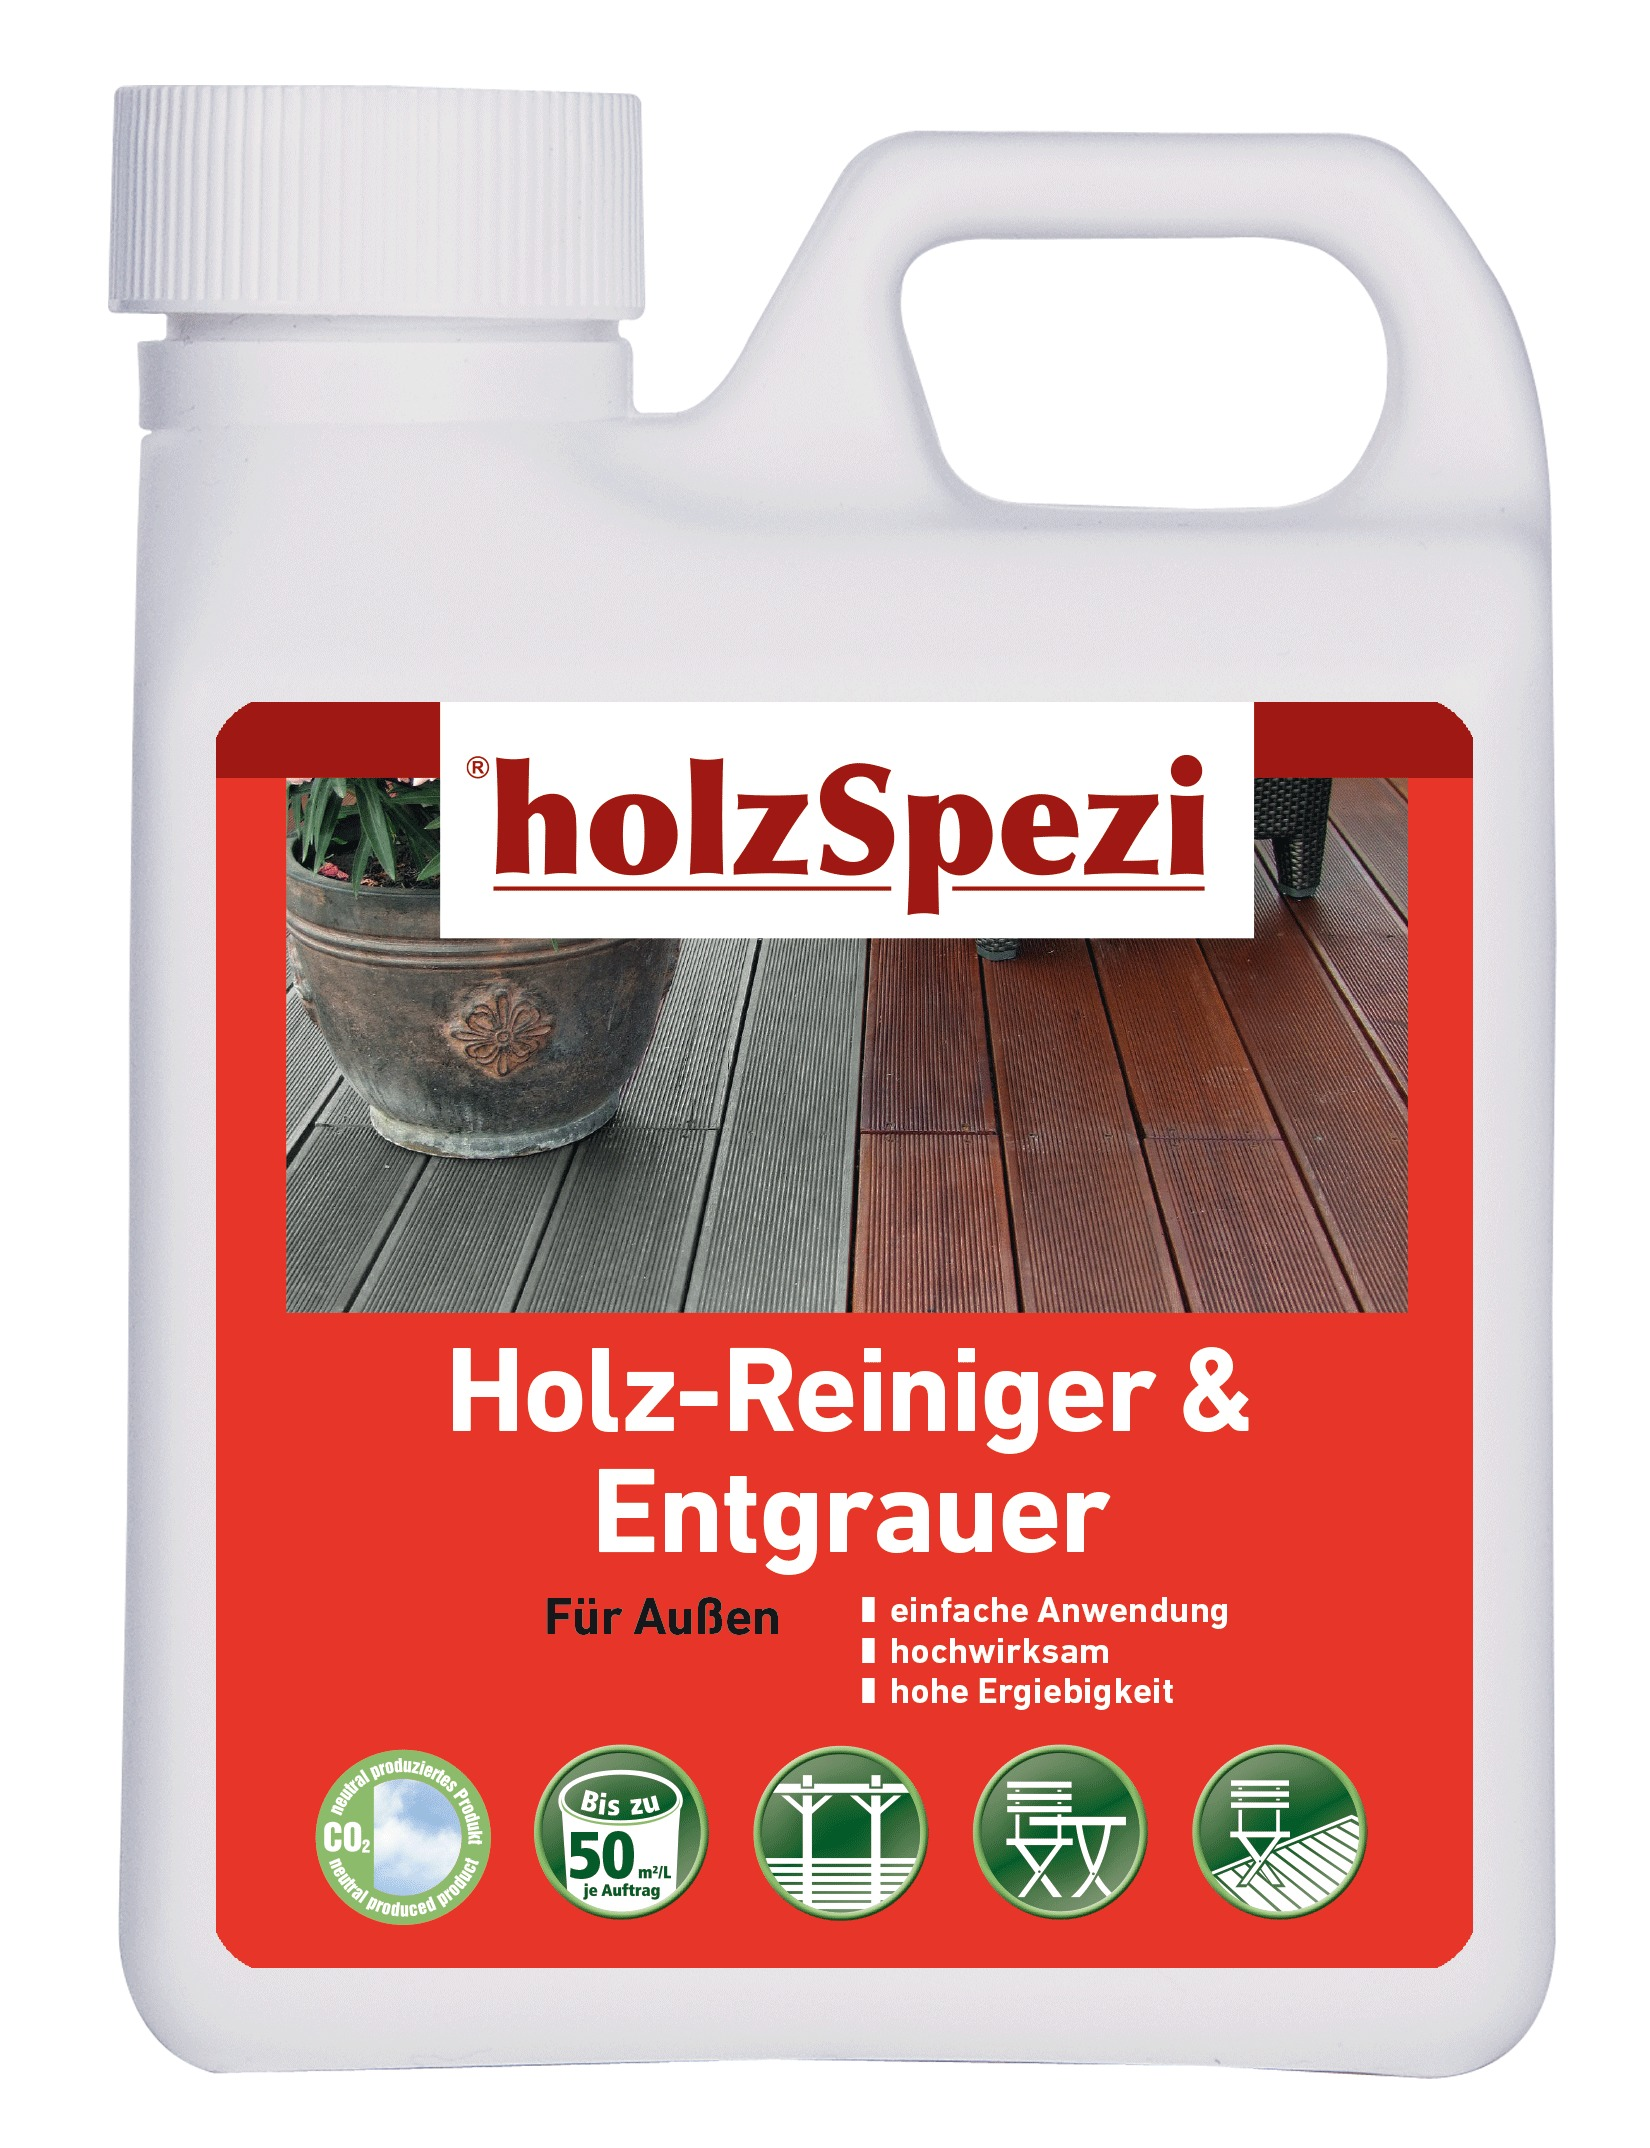 holzSpezi Holz-Reiniger & Entgrauer